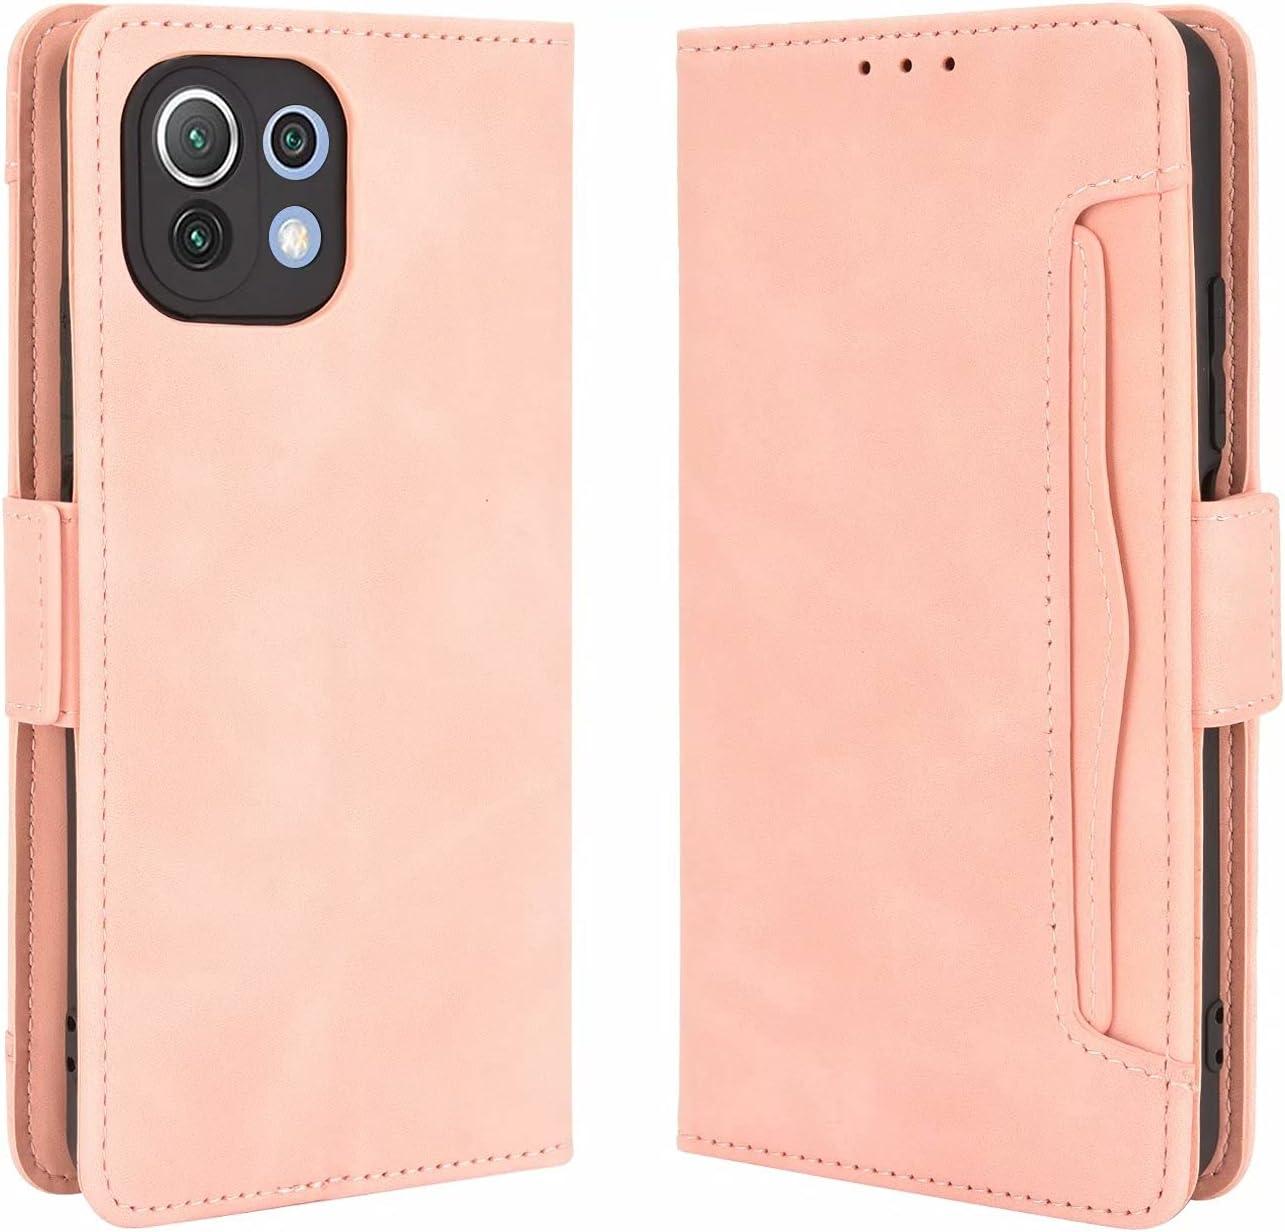 SOUFU Funda para Xiaomi Mi 11 Lite 5G/4G Funda,PU Cuero Flip Fundas Móvil de Tapa Libro con Effetto anticollisione e Anti para Xiaomi Mi 11 Lite 5G/4G Funda-Rosa